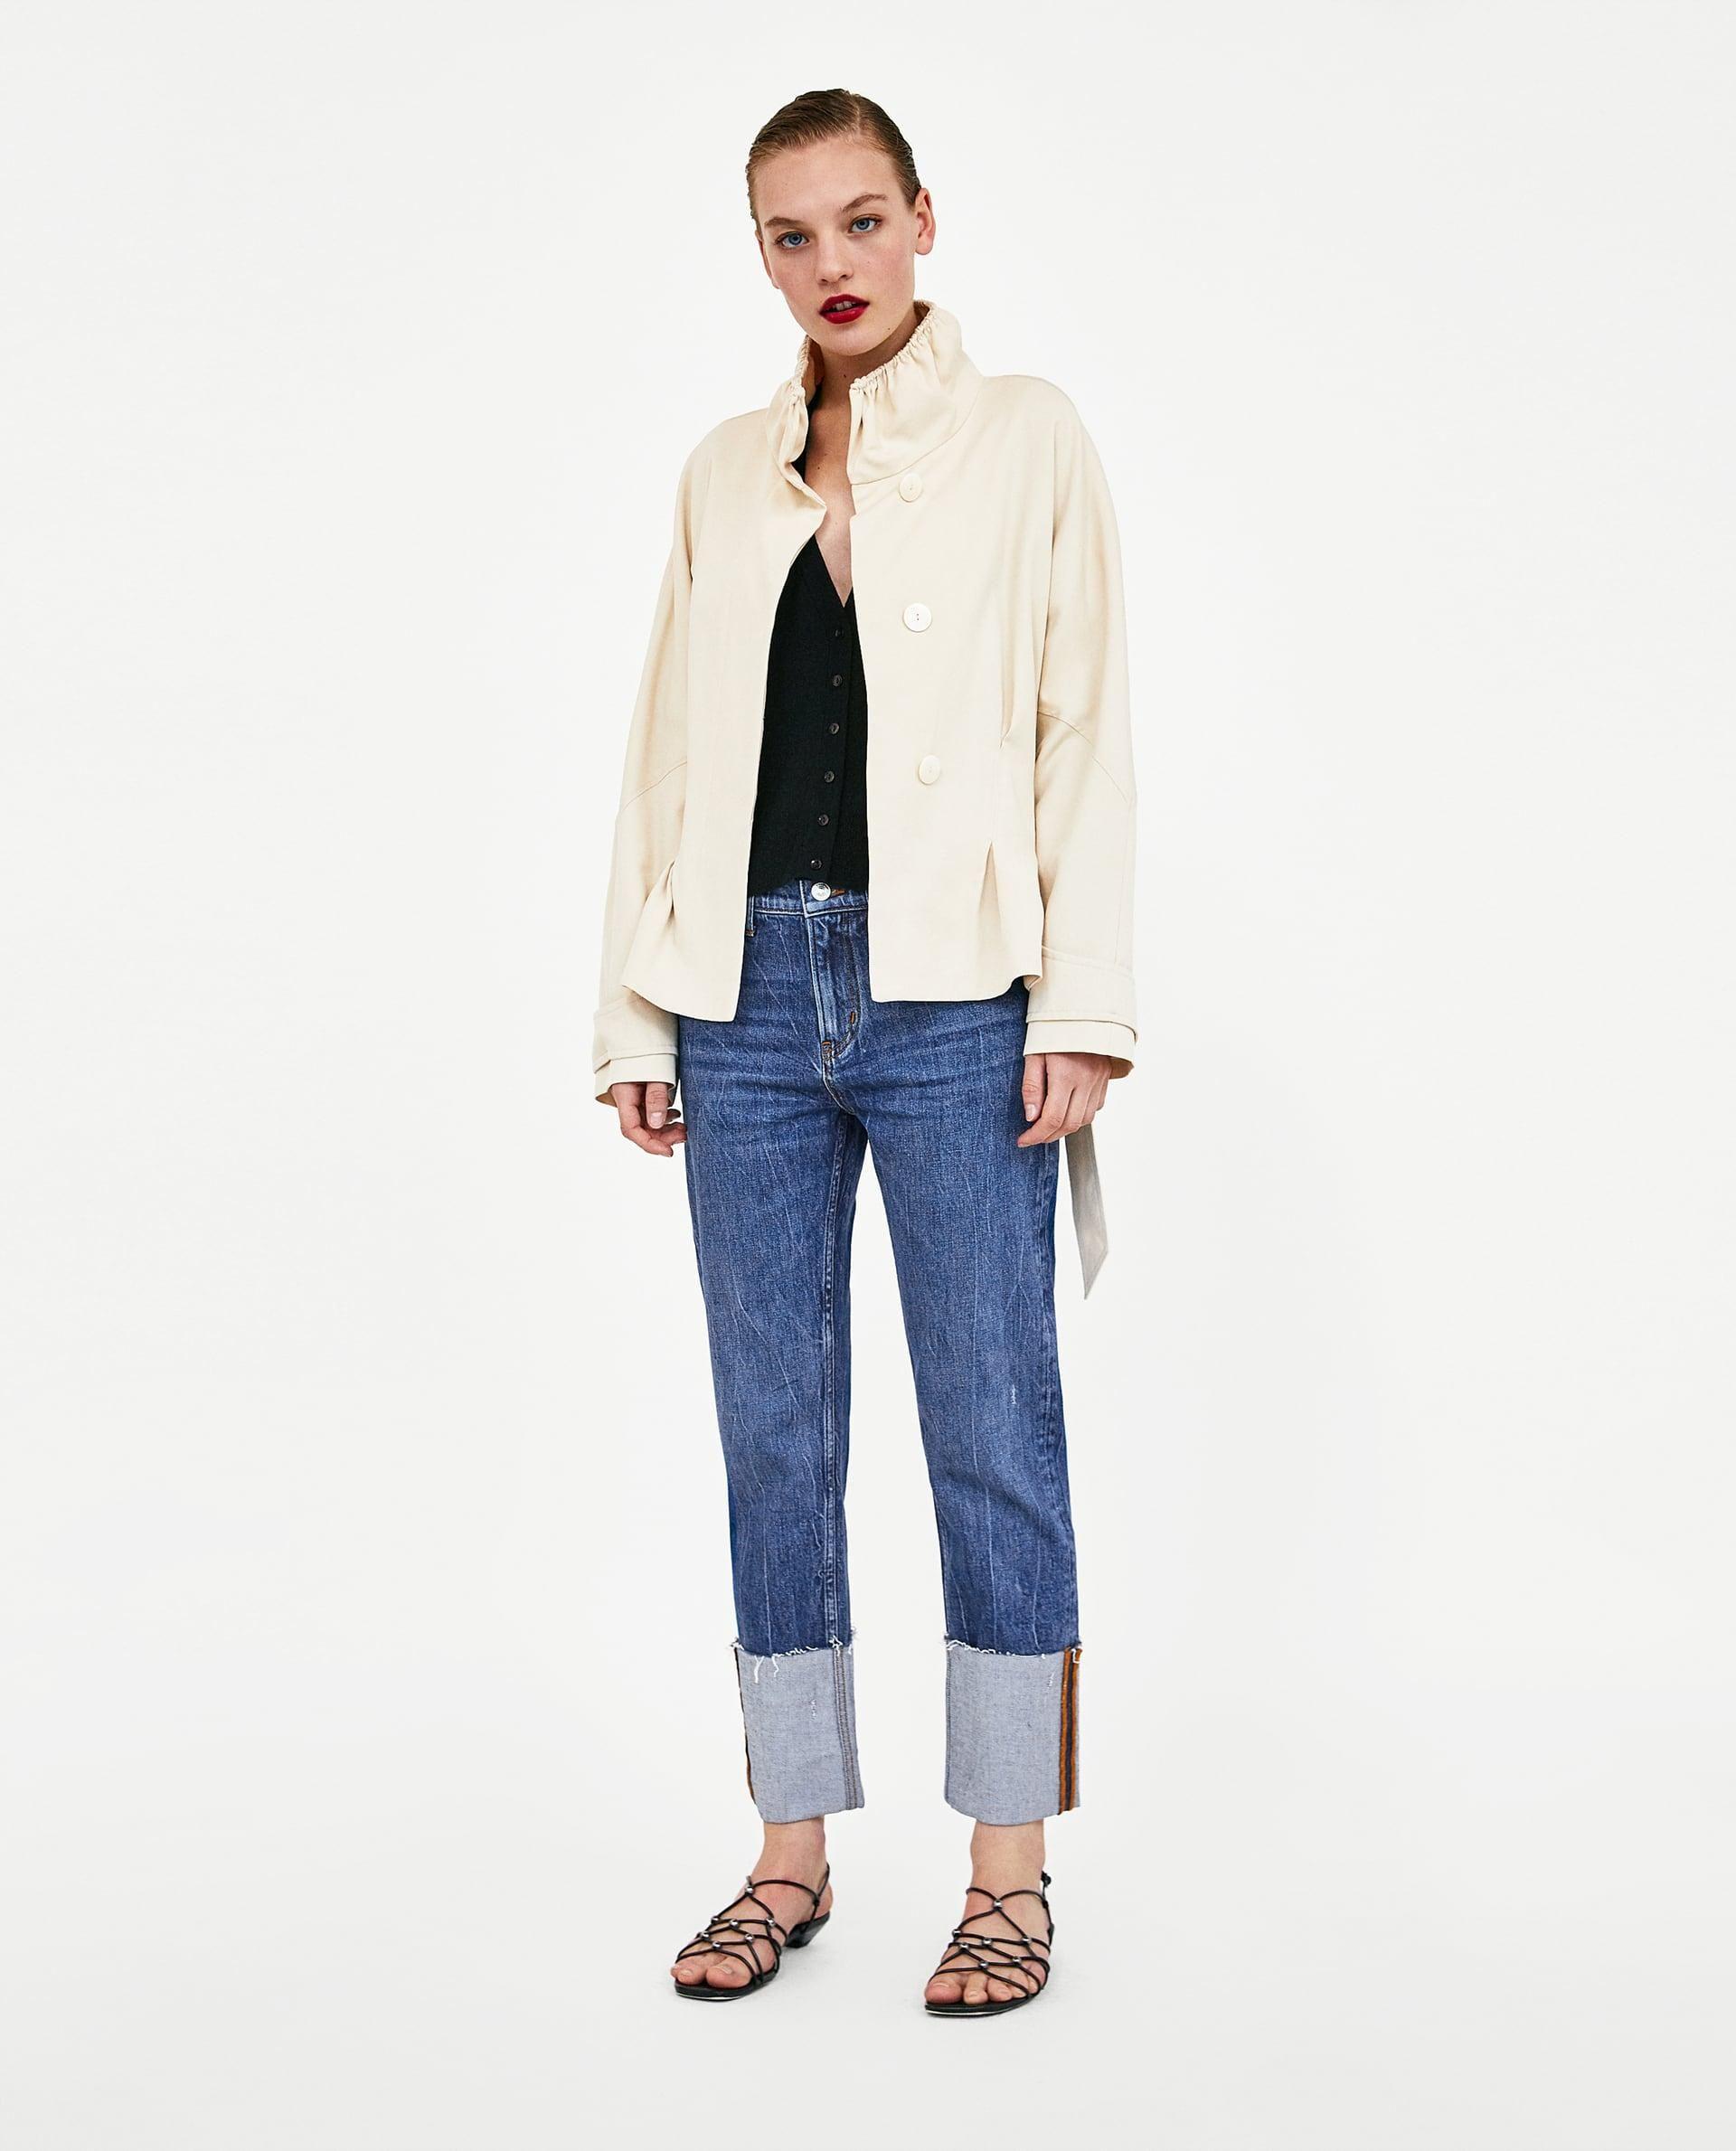 5da91f13c9 Jeans Folded Up Slim Legend Blue // 69.90 USD // Zara // The Folded ...